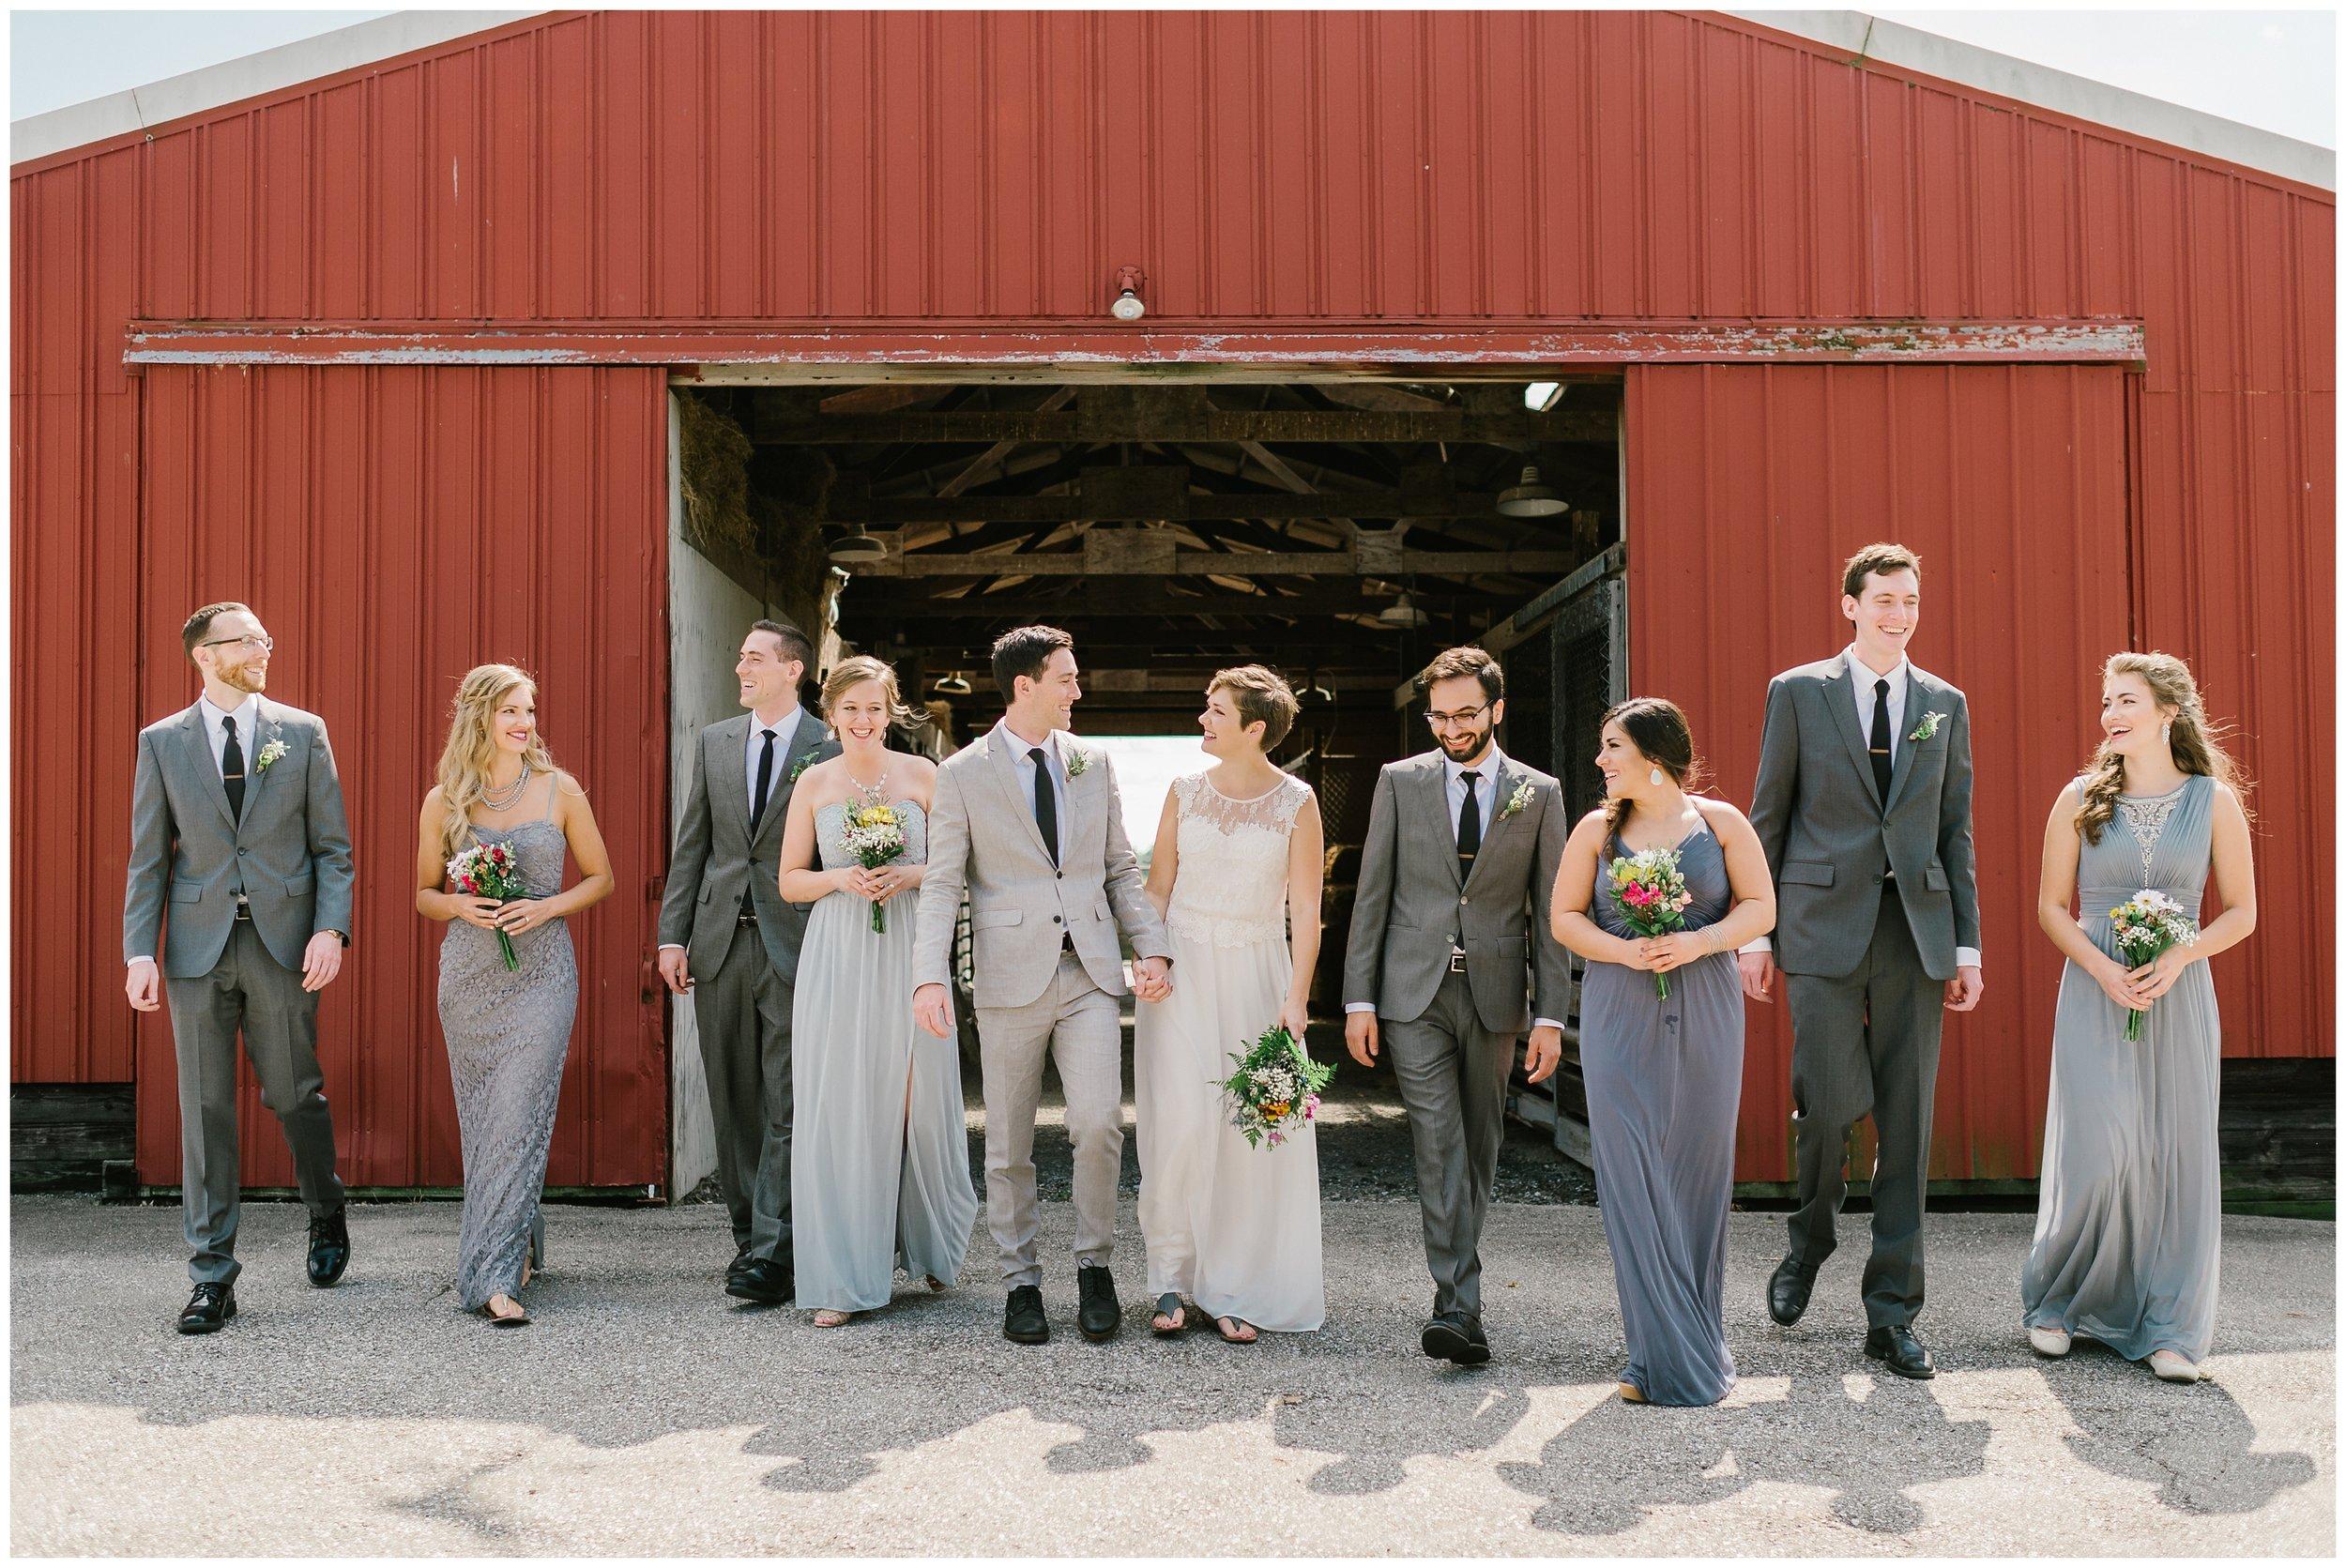 Rebecca_Shehorn_Photography_Indianapolis_Wedding_Photographer_7237.jpg